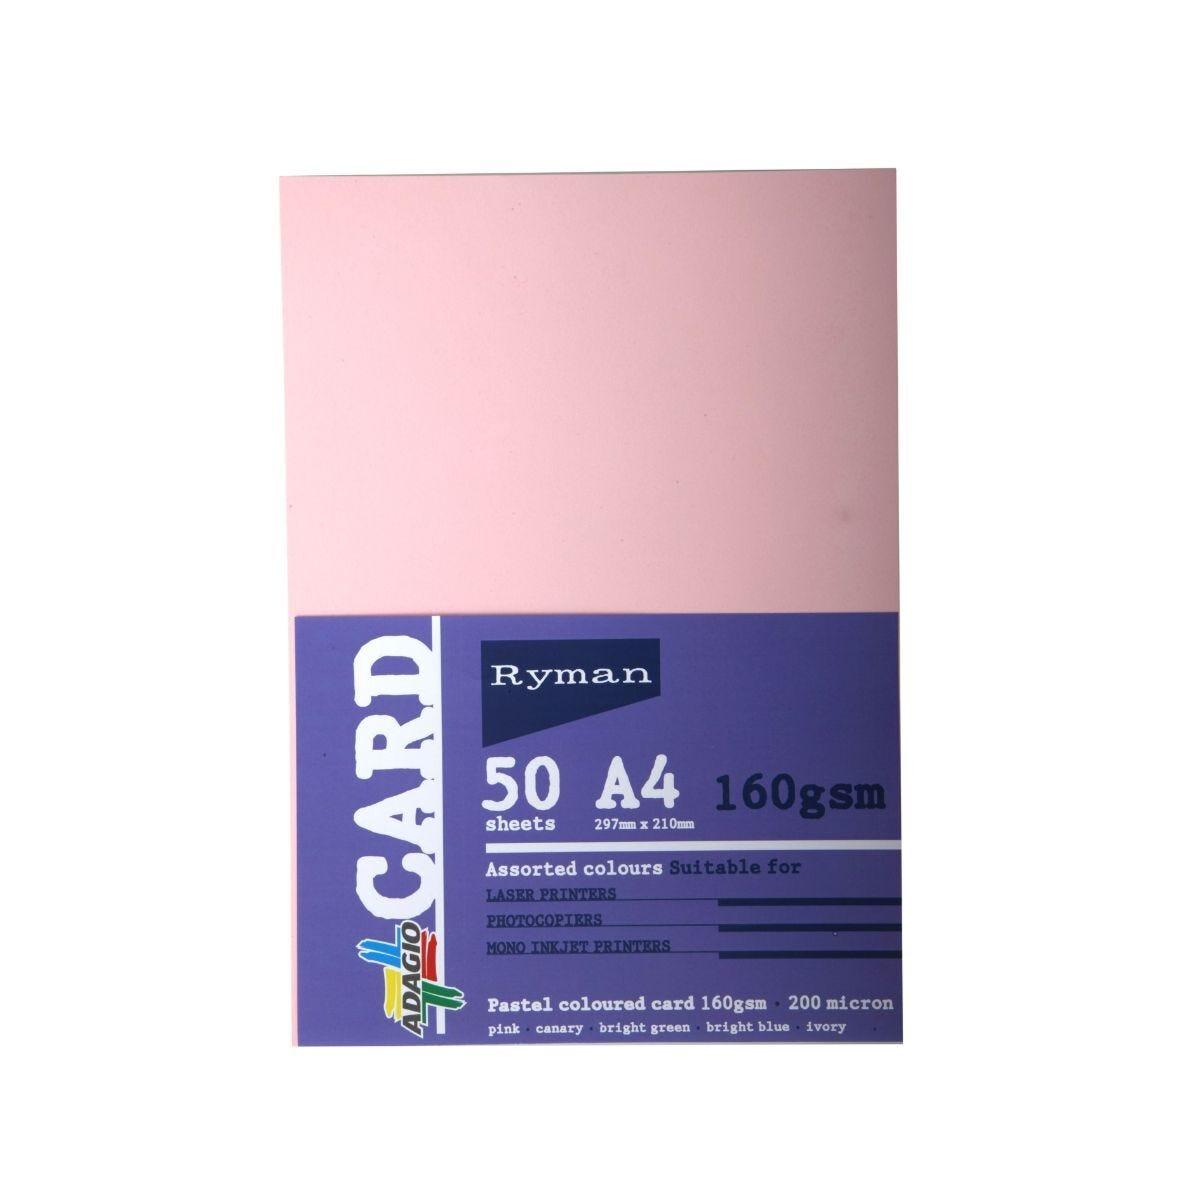 Ryman Adagio Card A4 160gsm 50 Sheets light assorted